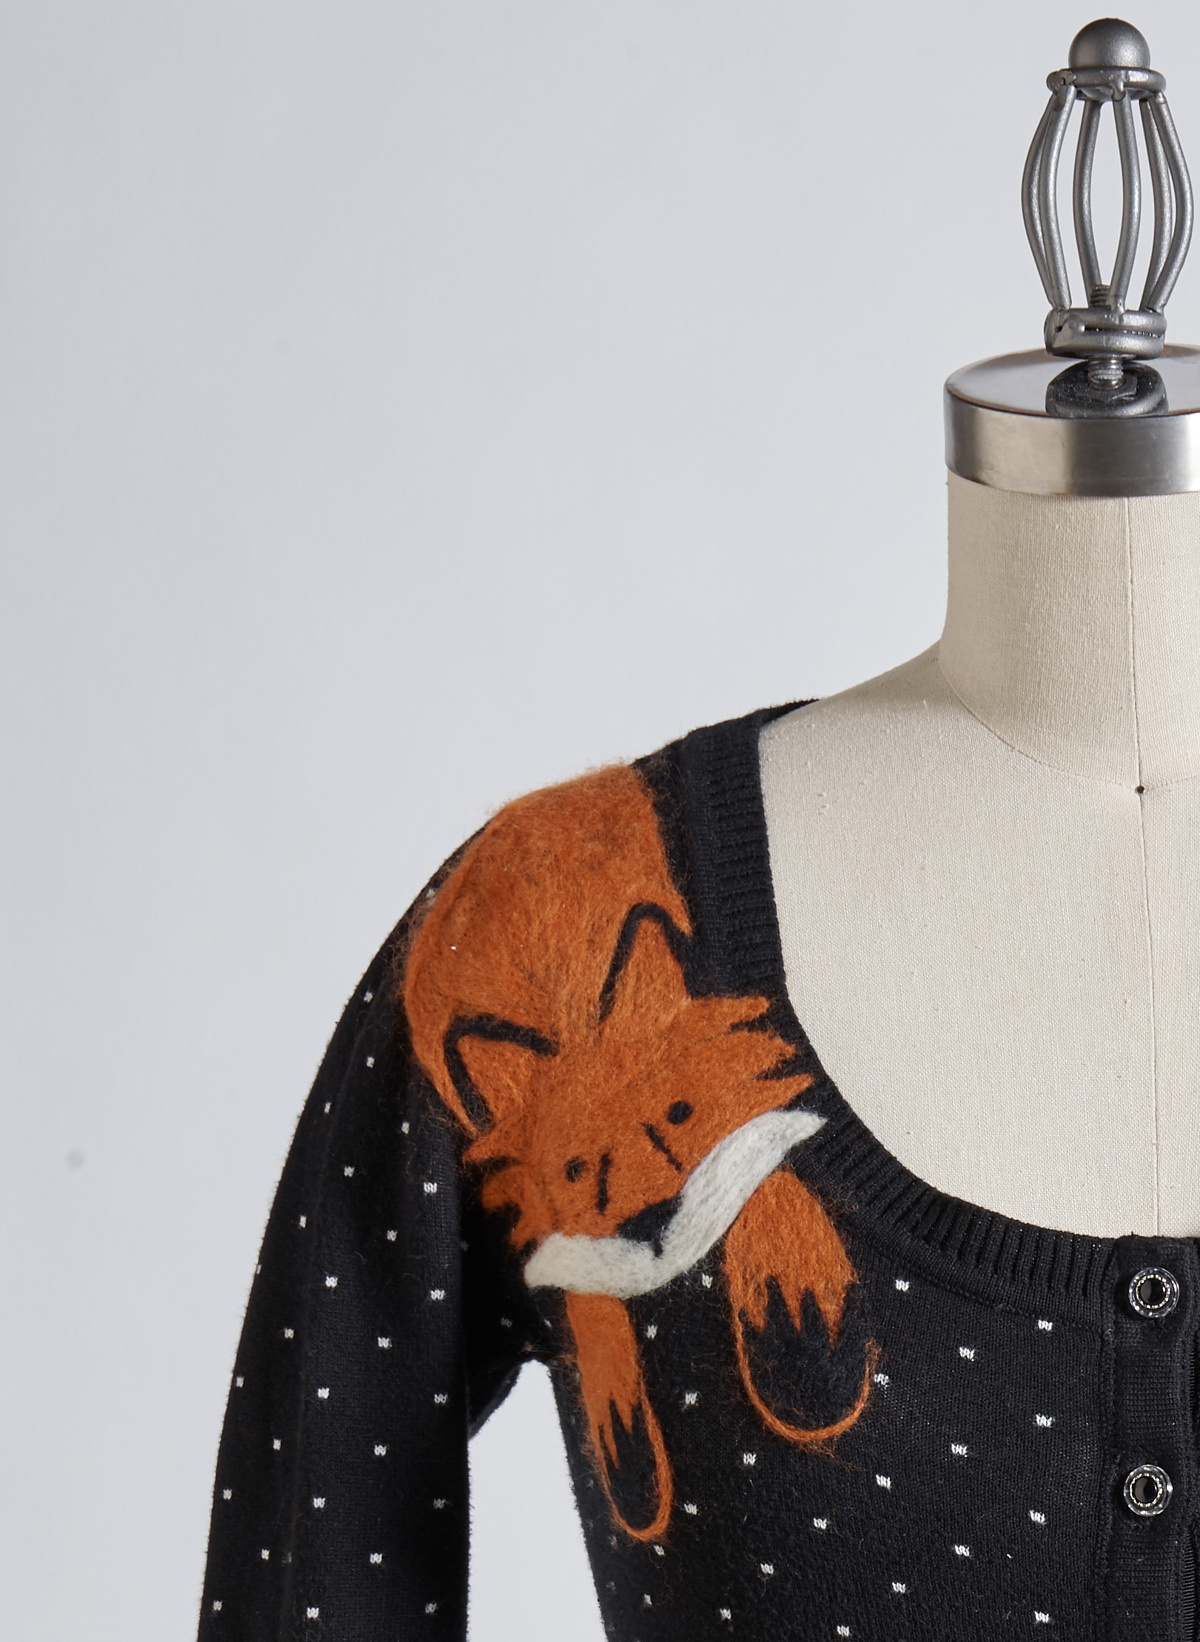 felted fox cardigan close-up